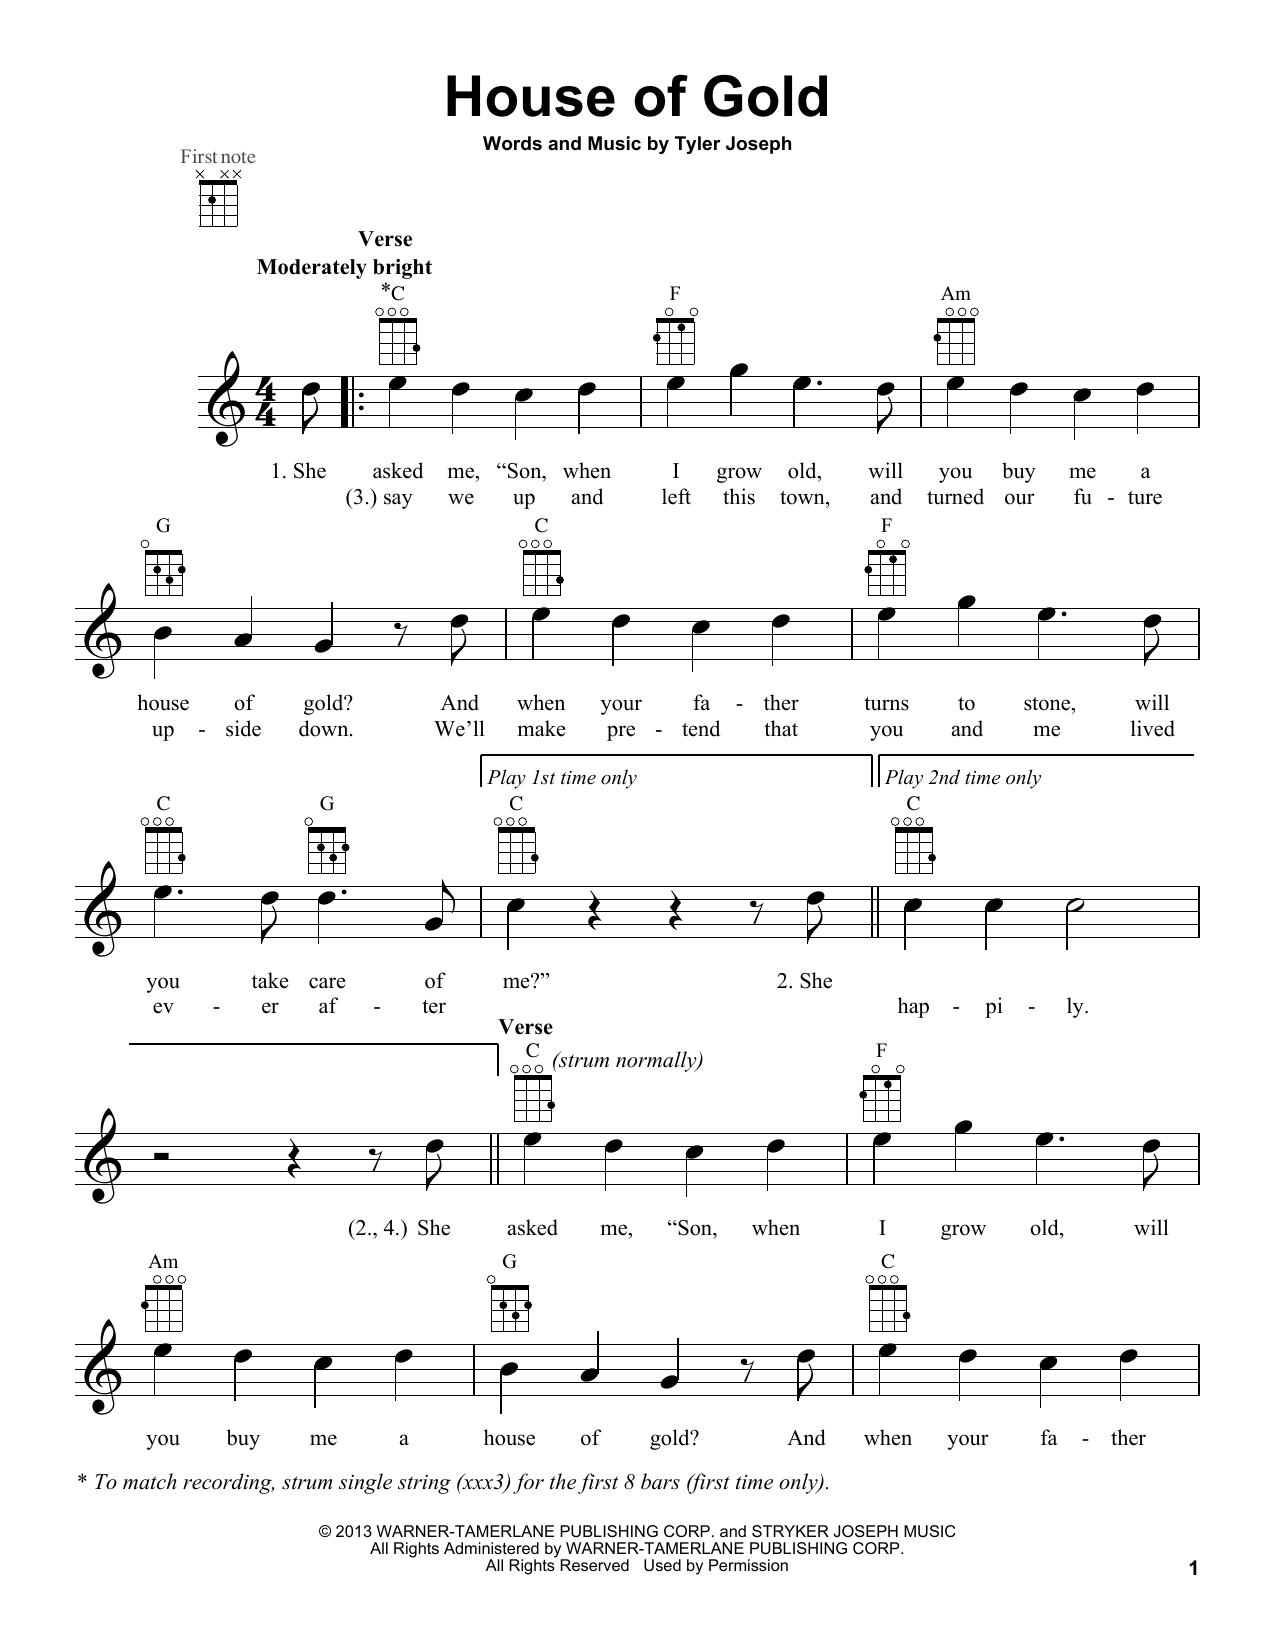 Twenty One Pilots 'House Of Gold' Sheet Music Notes, Chords   Download  Printable Ukulele Chords/Lyrics   SKU 15